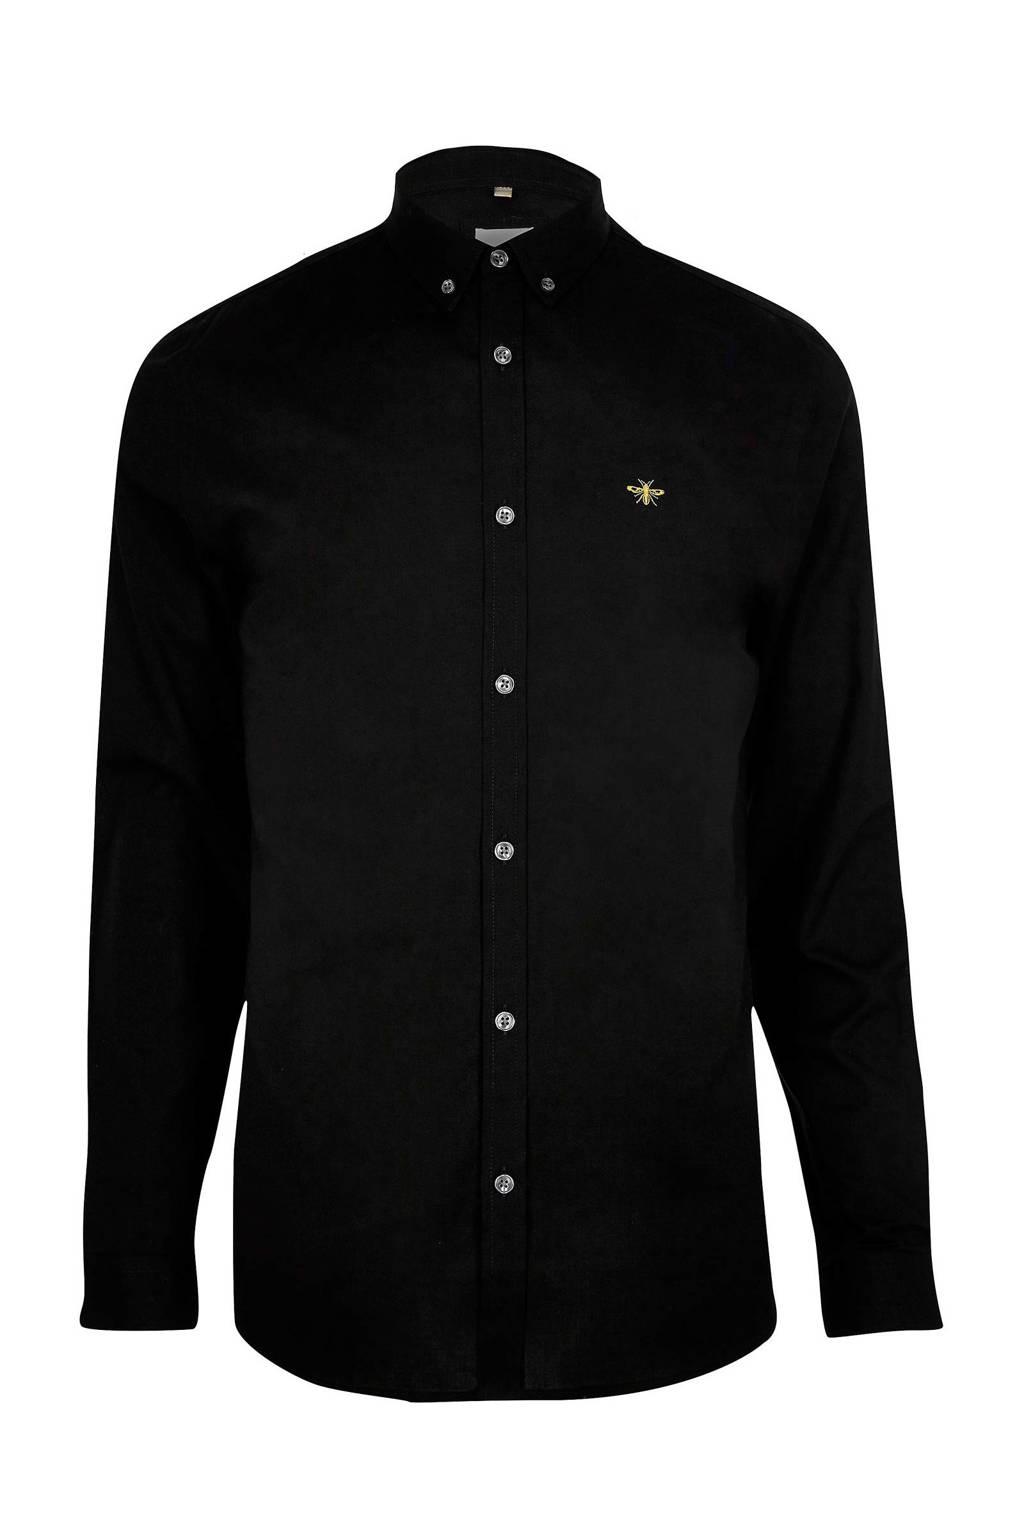 River Island overhemd, Zwart